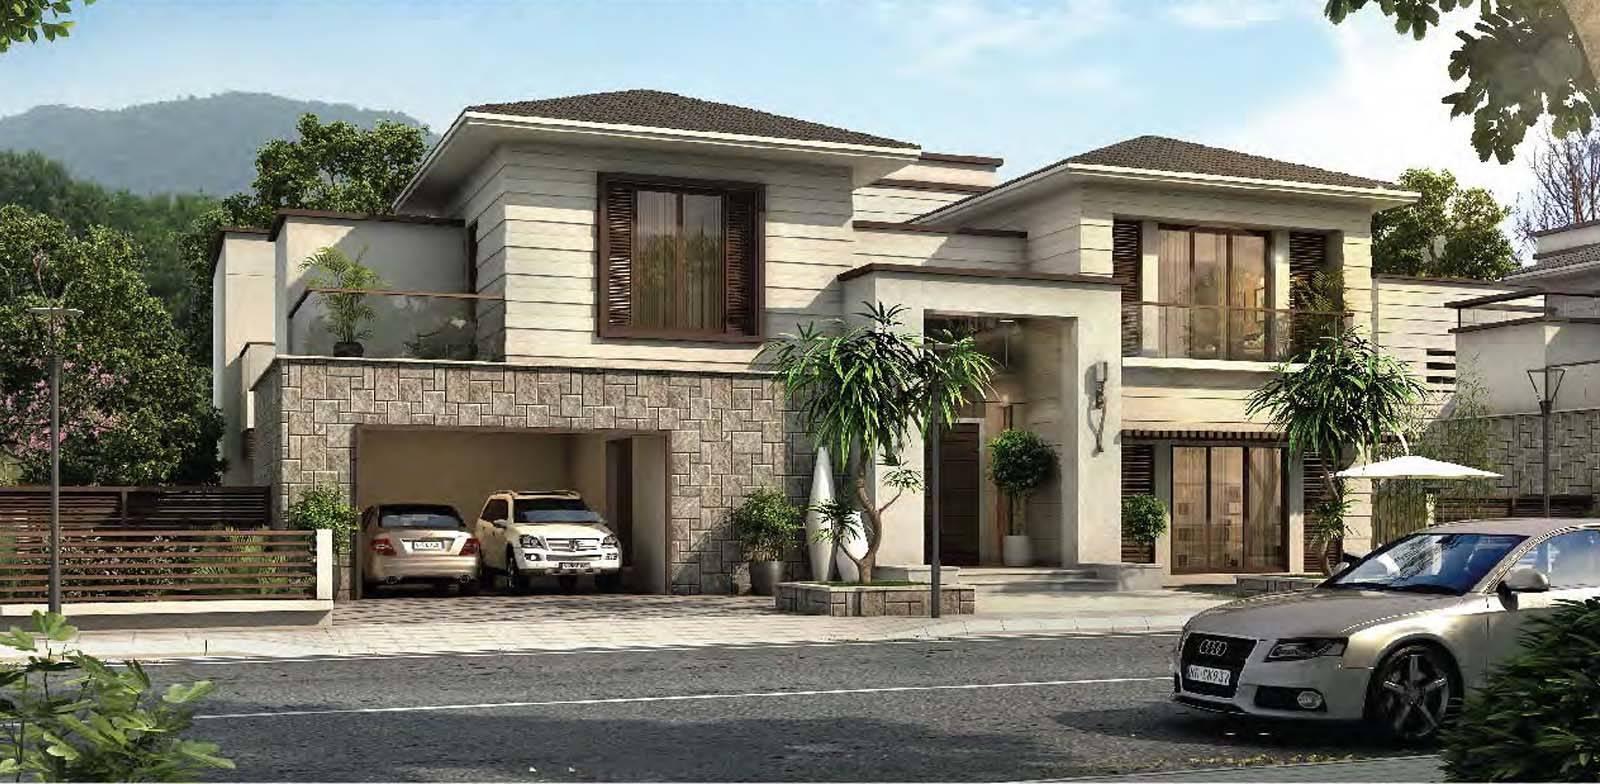 Sobha lifestyle legacy in devanahalli bangalore price for Legacy house